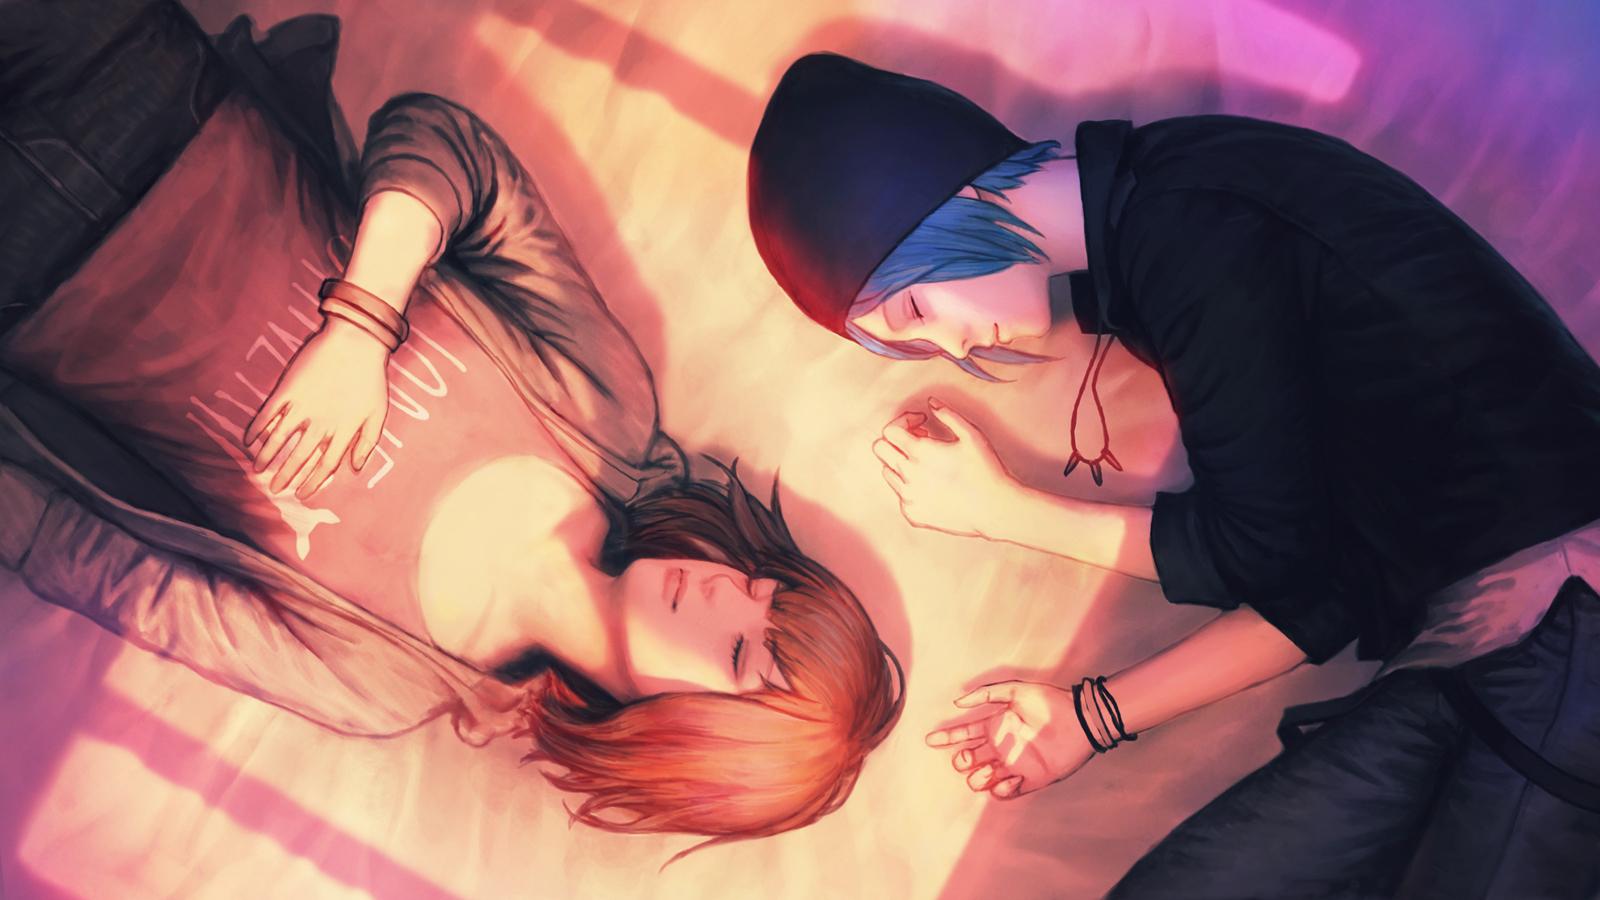 Chloe Price Life Is Strange Max Caulfield Sleeping 1600x900